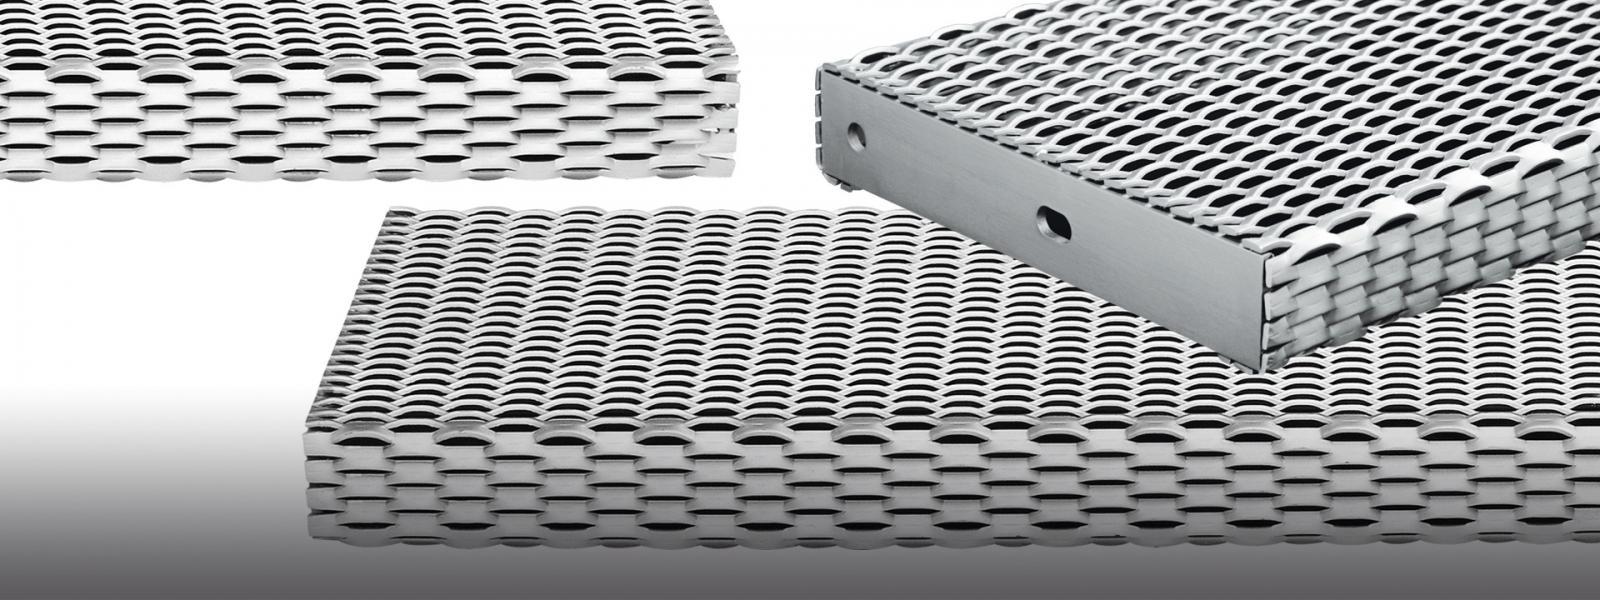 Metal mesh stair treads and landings - Antislip